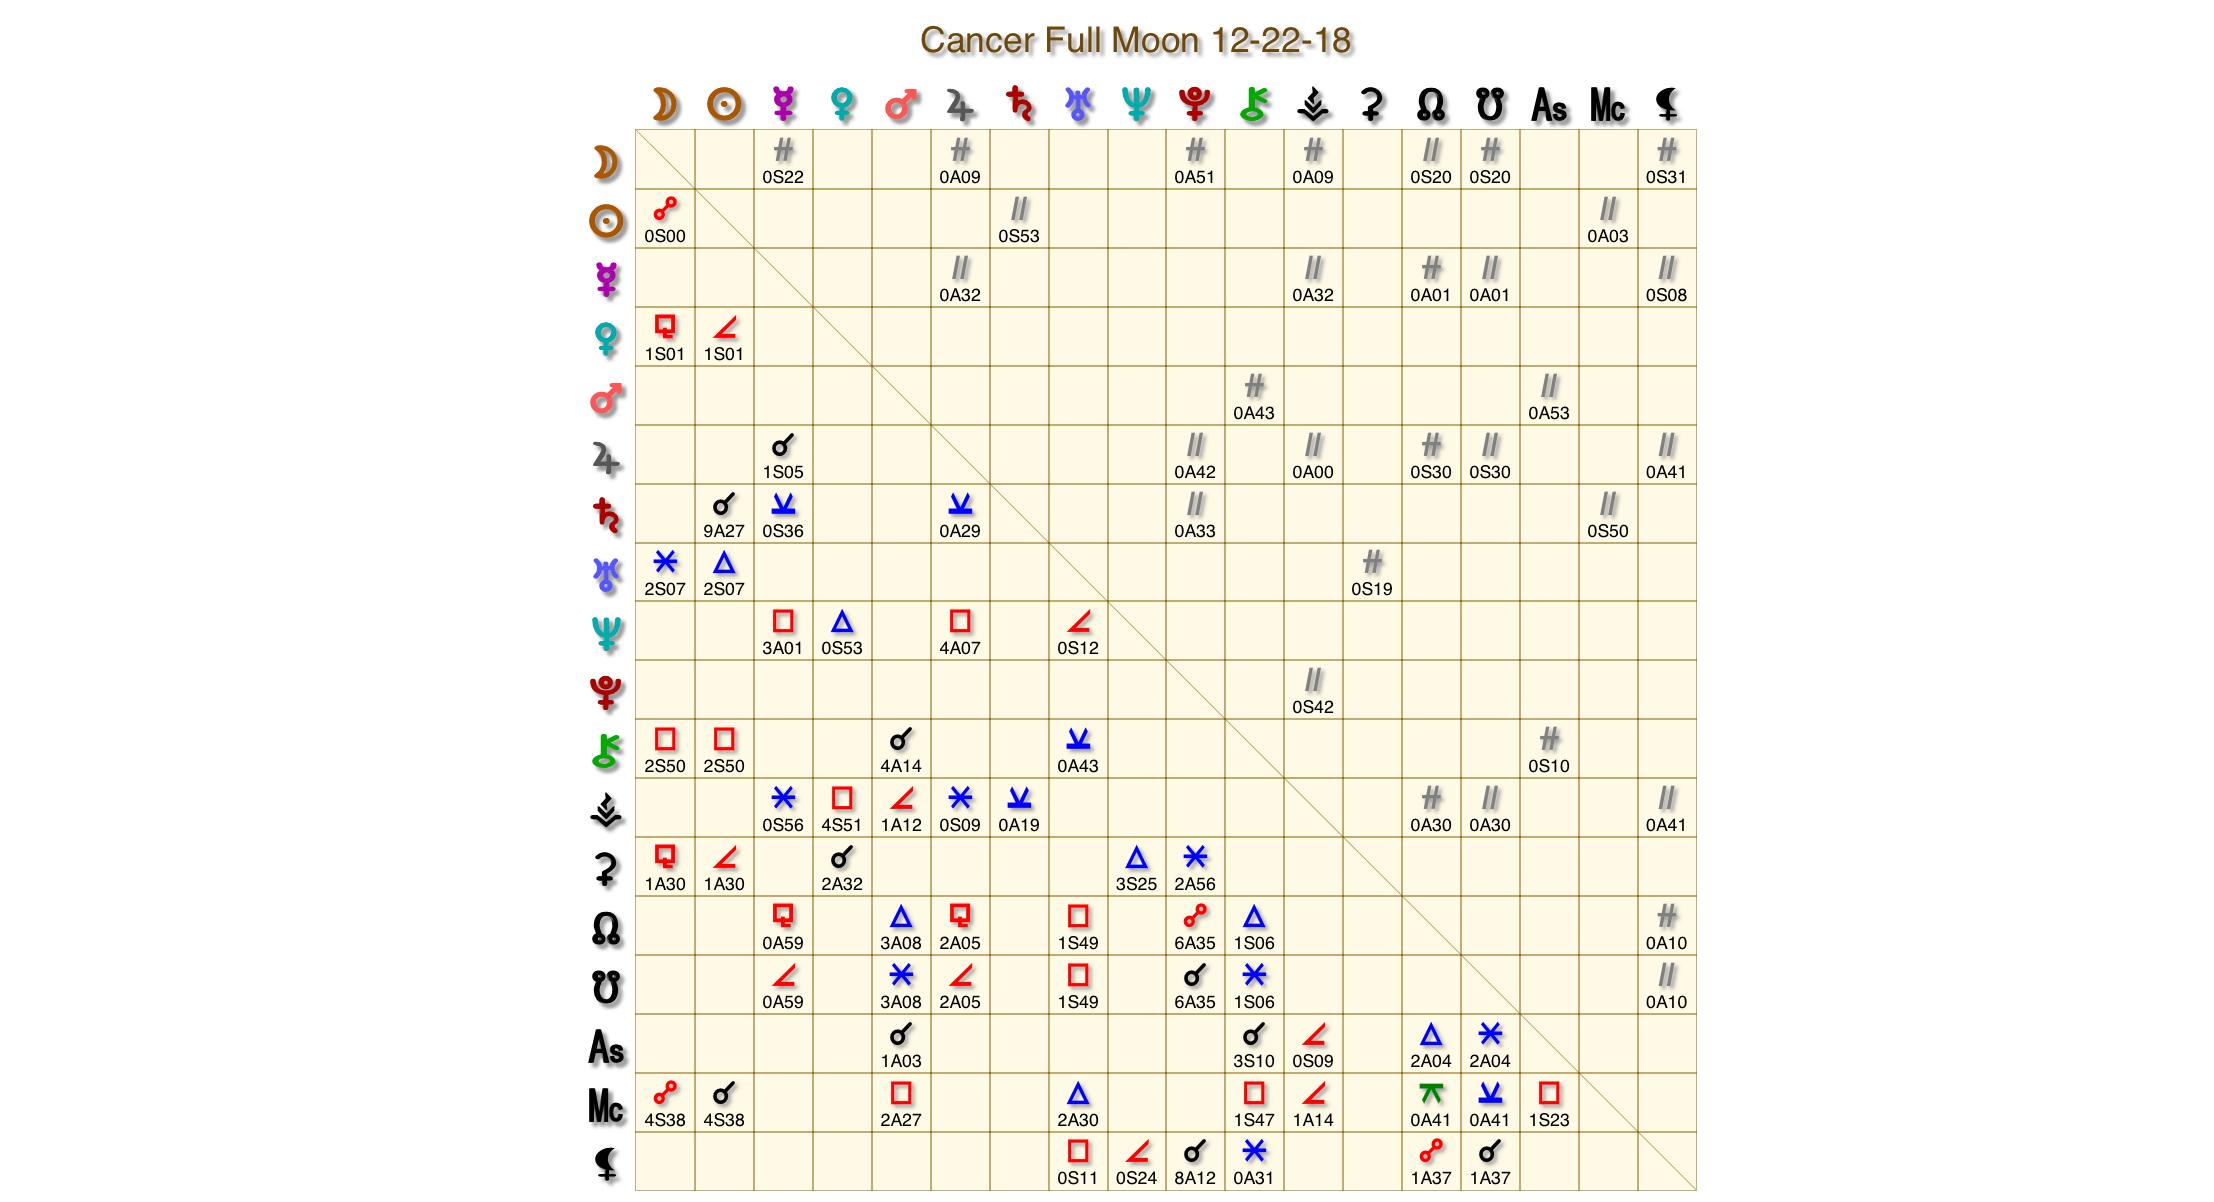 Cancer Full Moon Grid